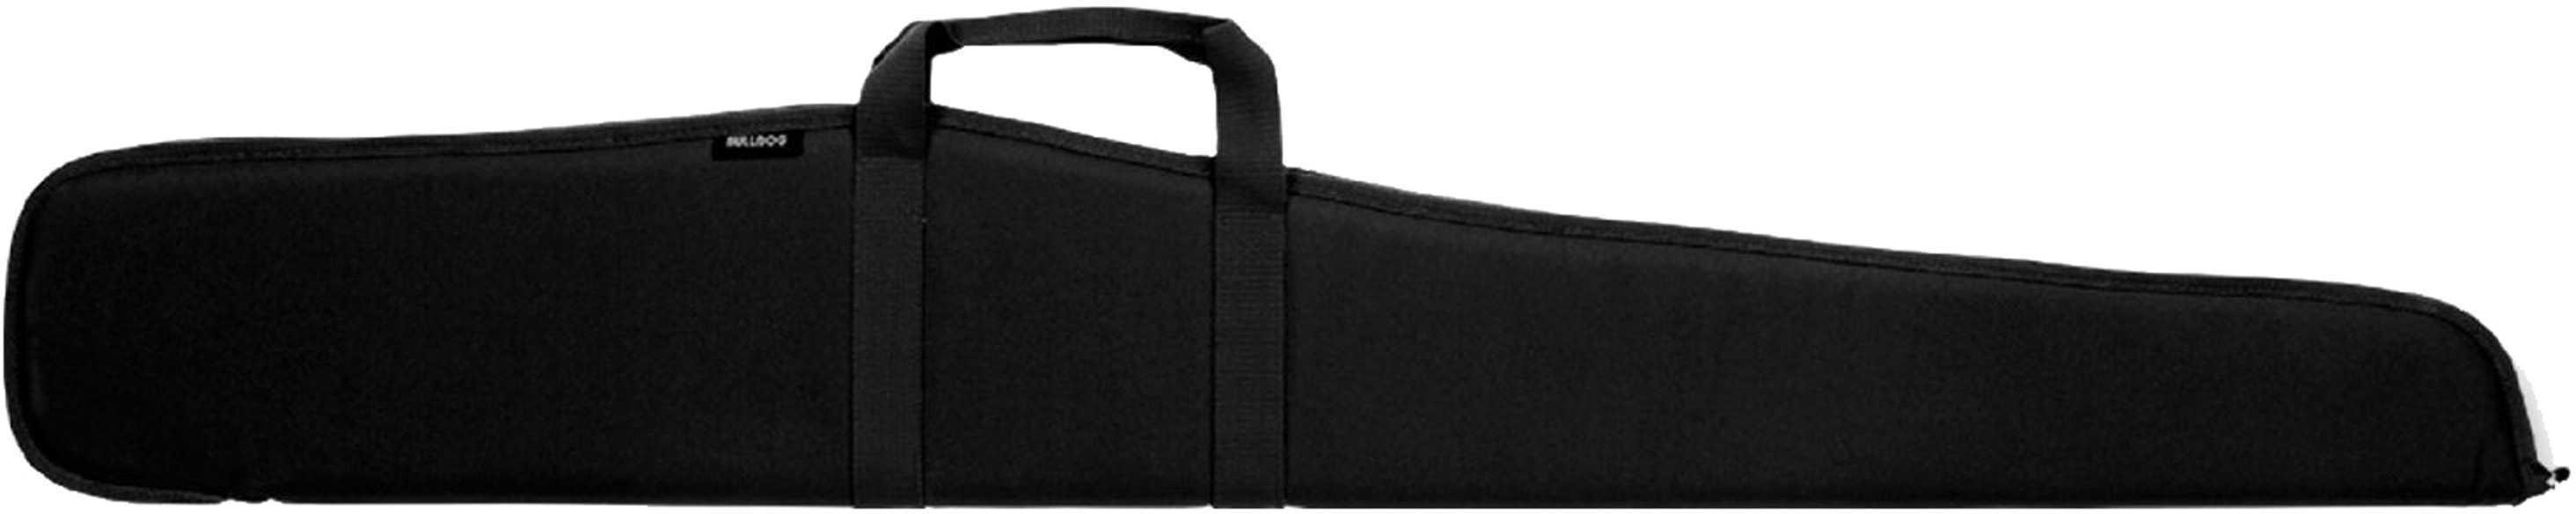 "Bulldog Cases Economy Single Shotgun Black Soft 52"" BD110"